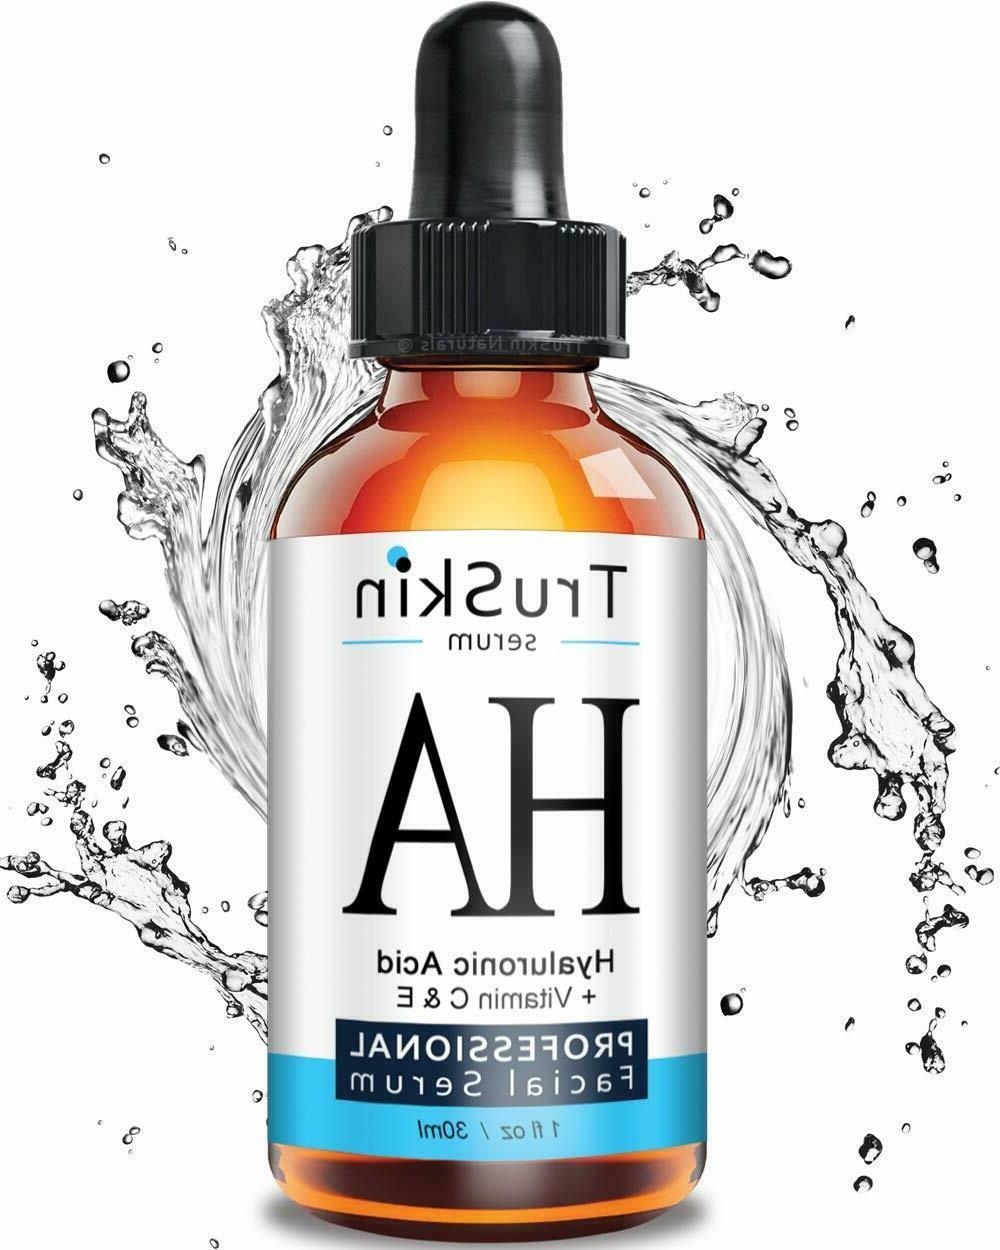 TruSkin Naturals The BEST Hyaluronic Acid Serum for Skin &Fa